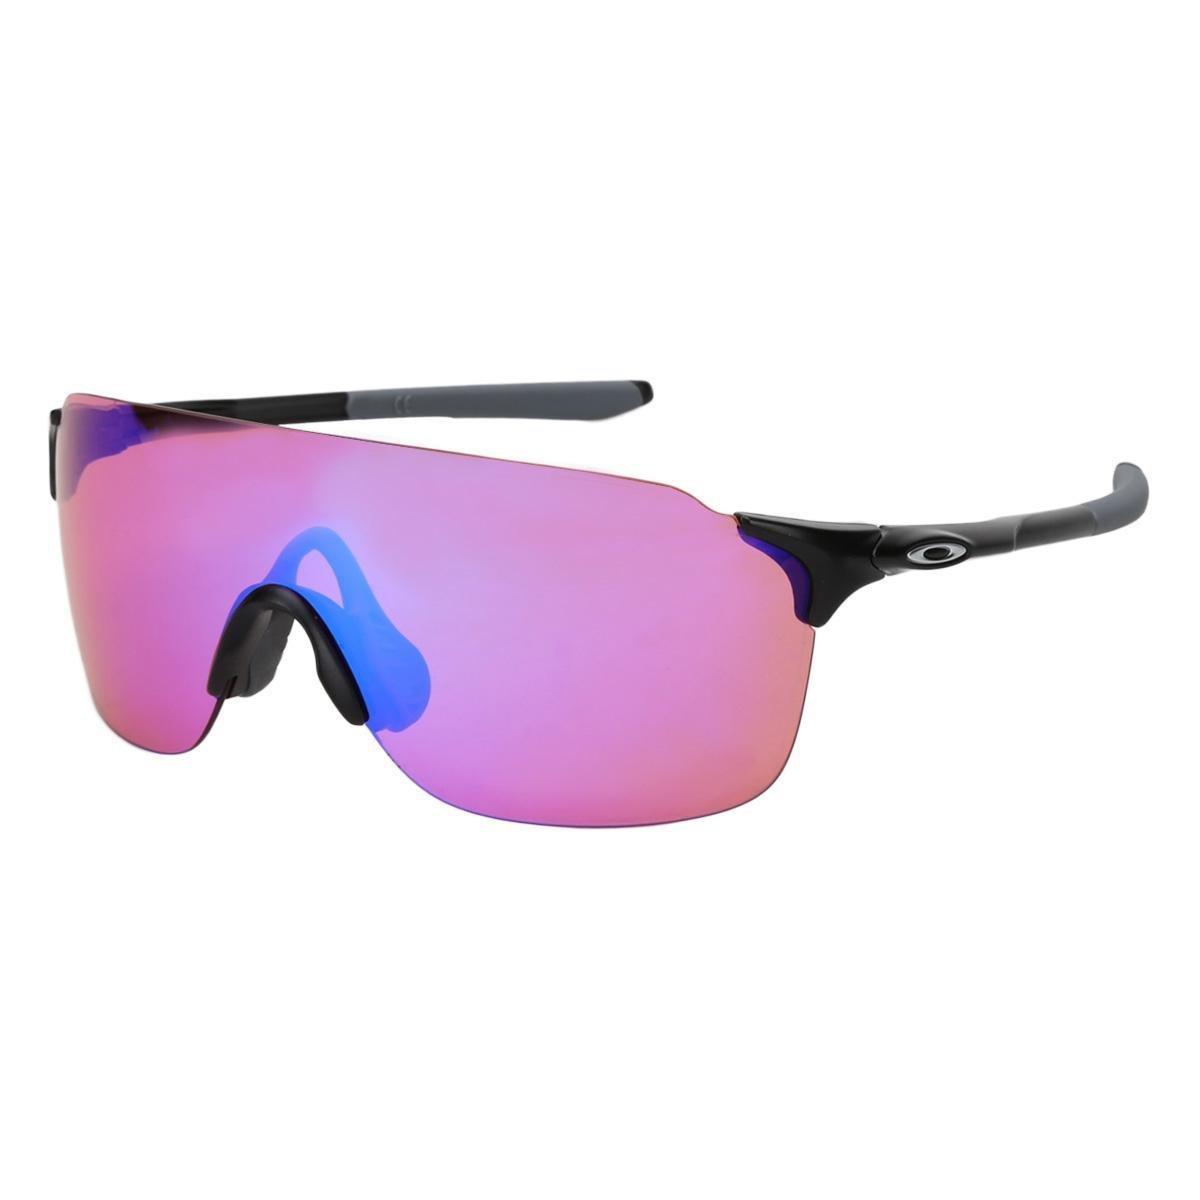 Óculos Oakley Evzero Stride Prizm Trail - Preto - Compre Agora ... 5a1539cef1